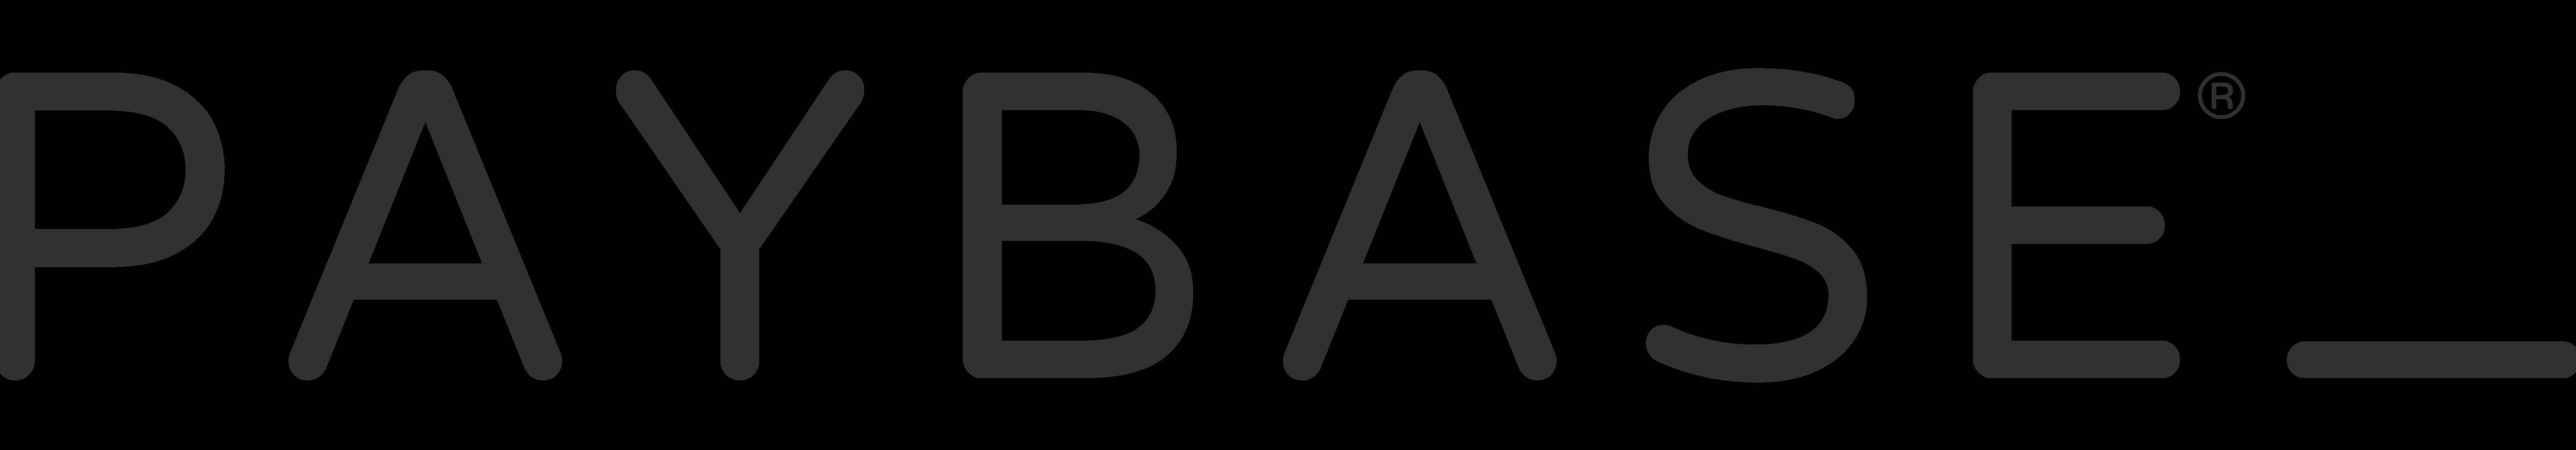 Paybase Logo